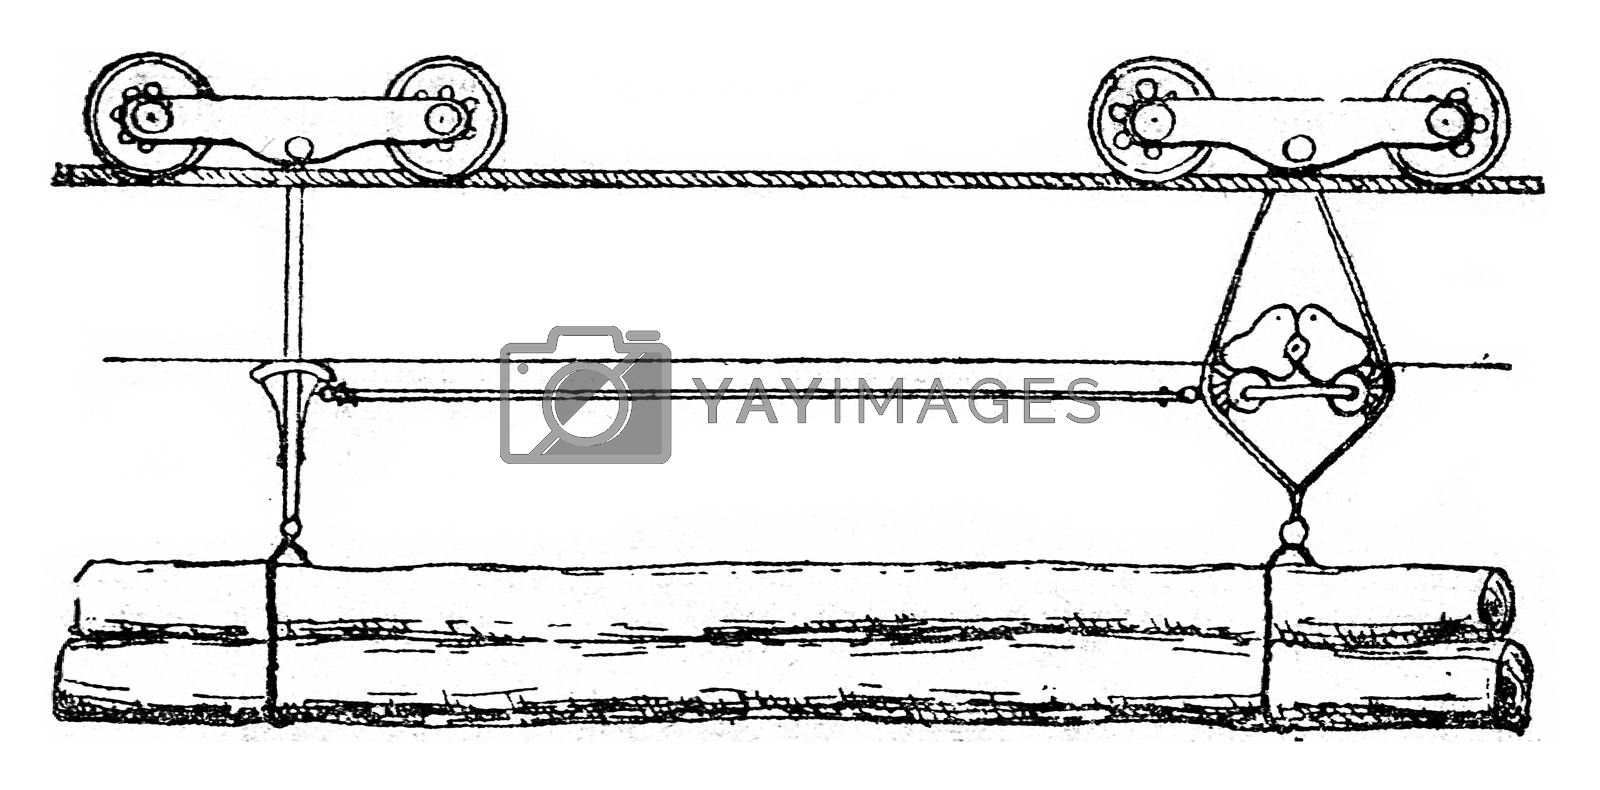 Apparatus for telpherage woods, vintage engraved illustration.